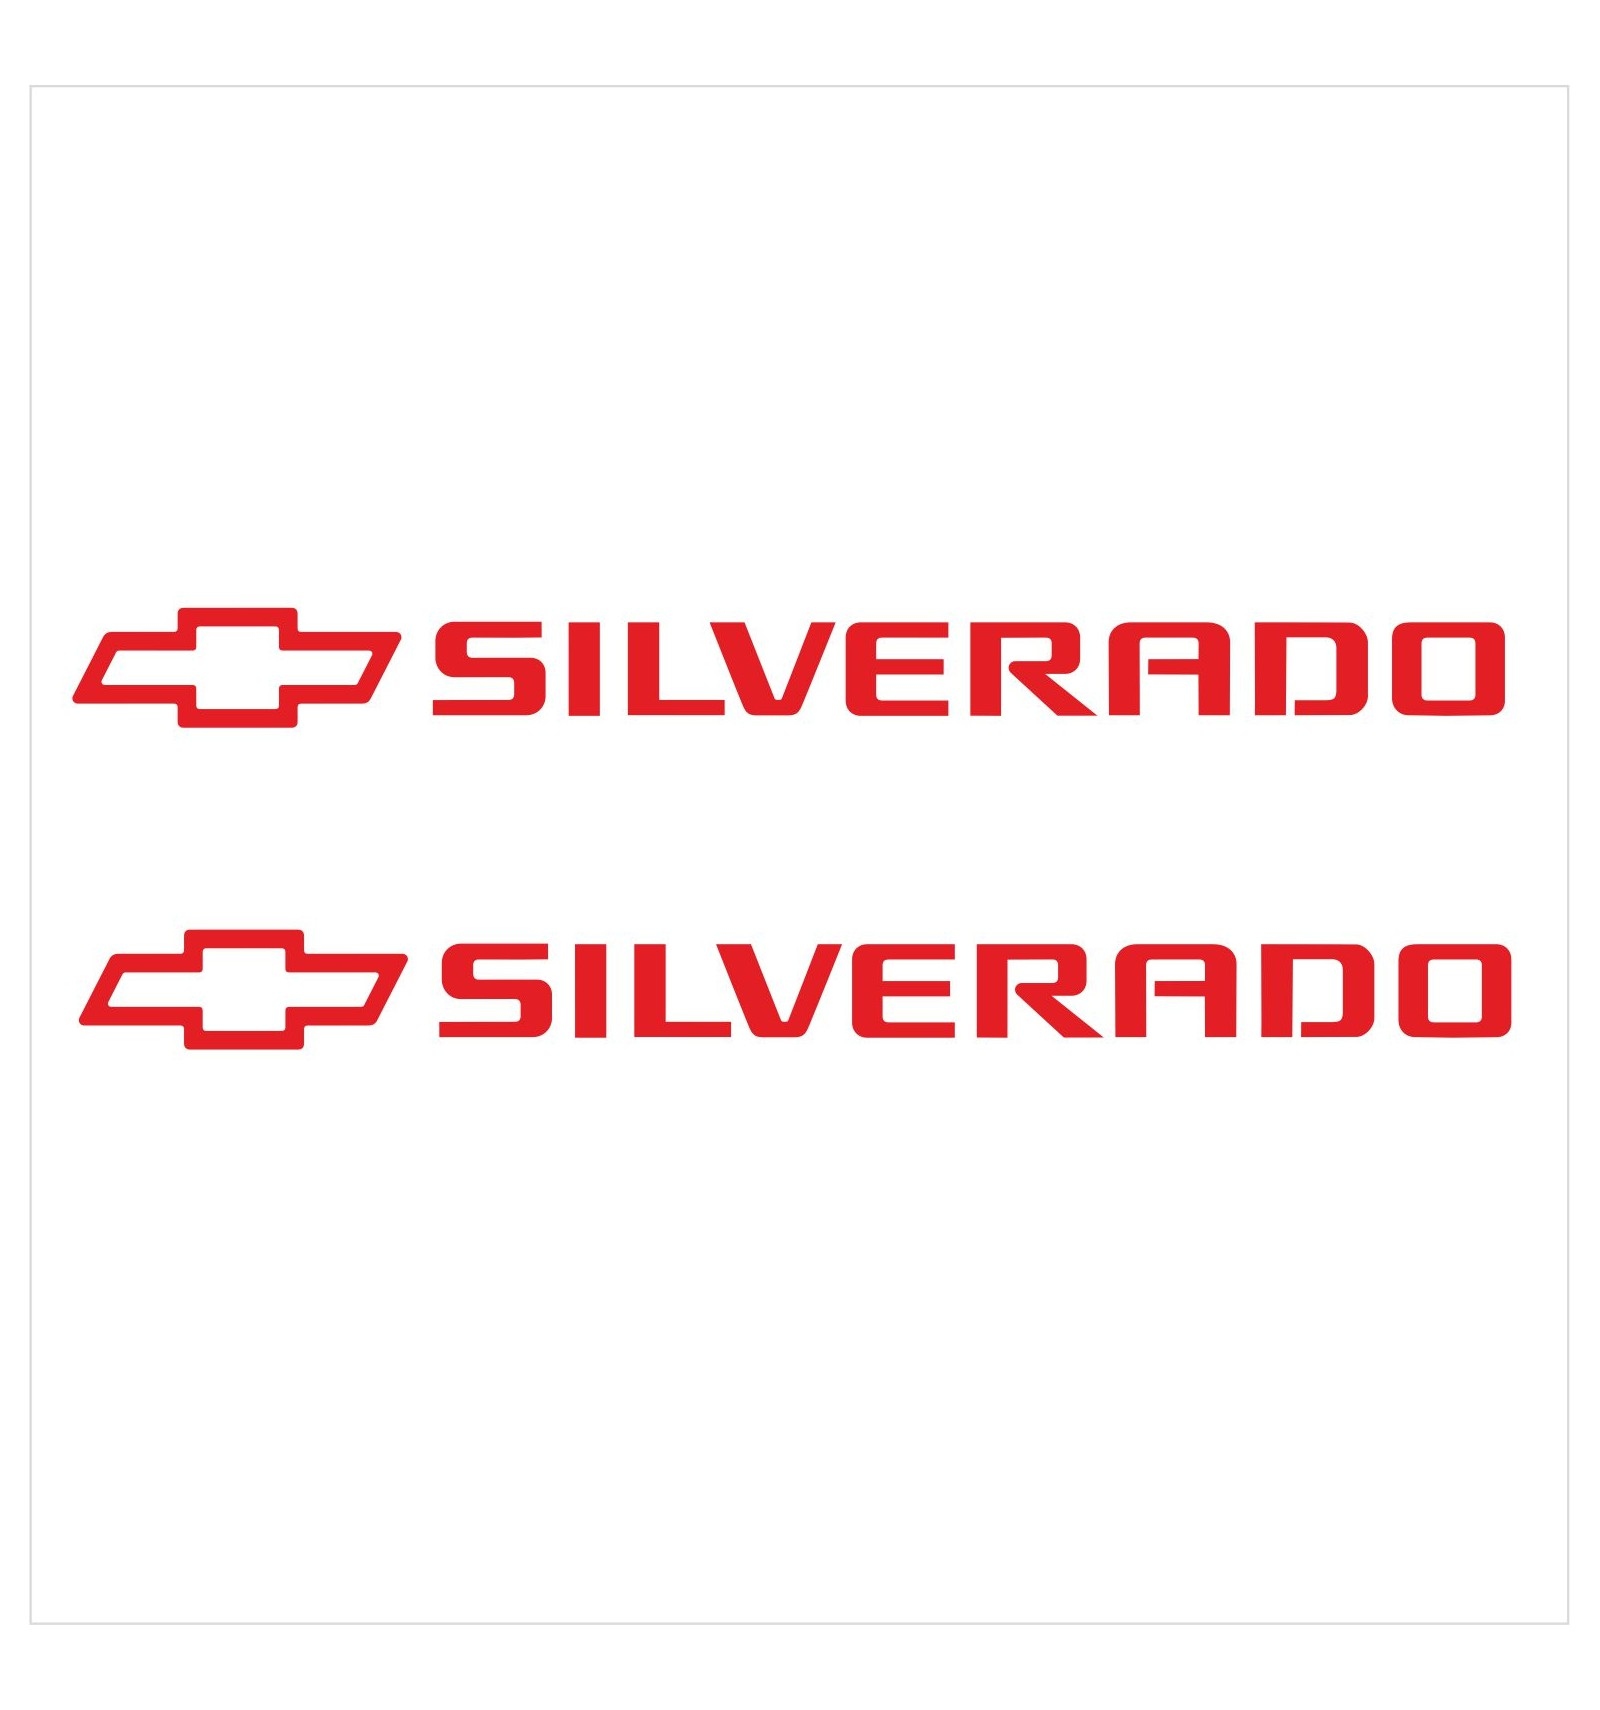 Set Of 2 Pieces Silverado Logo Vinyl Decal Sticker For Your